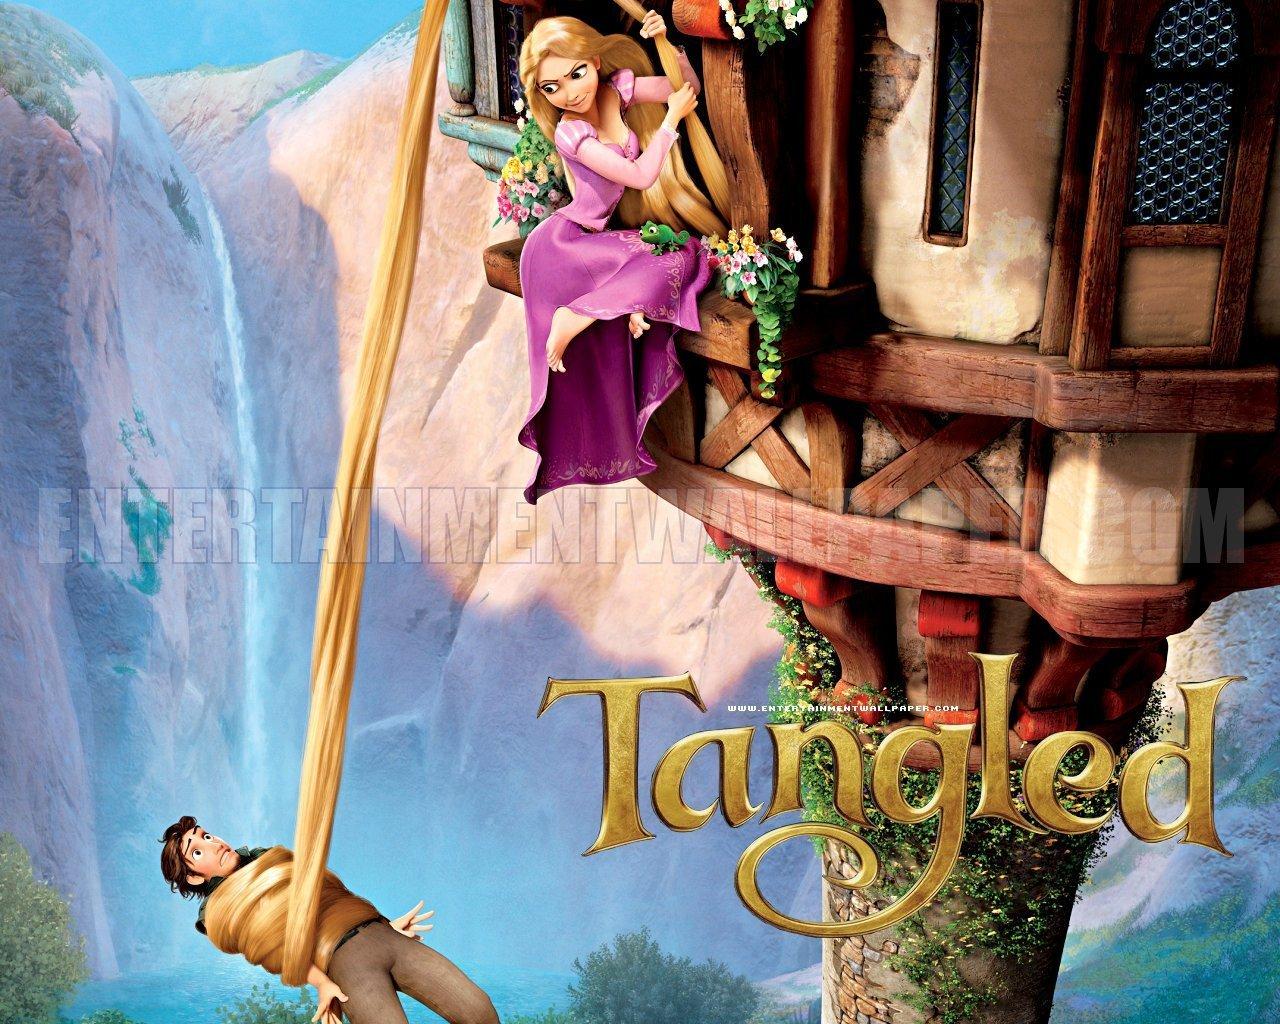 Tangled Disney Wallpaper   Princess Rapunzel from Tangled Wallpaper 1280x1024